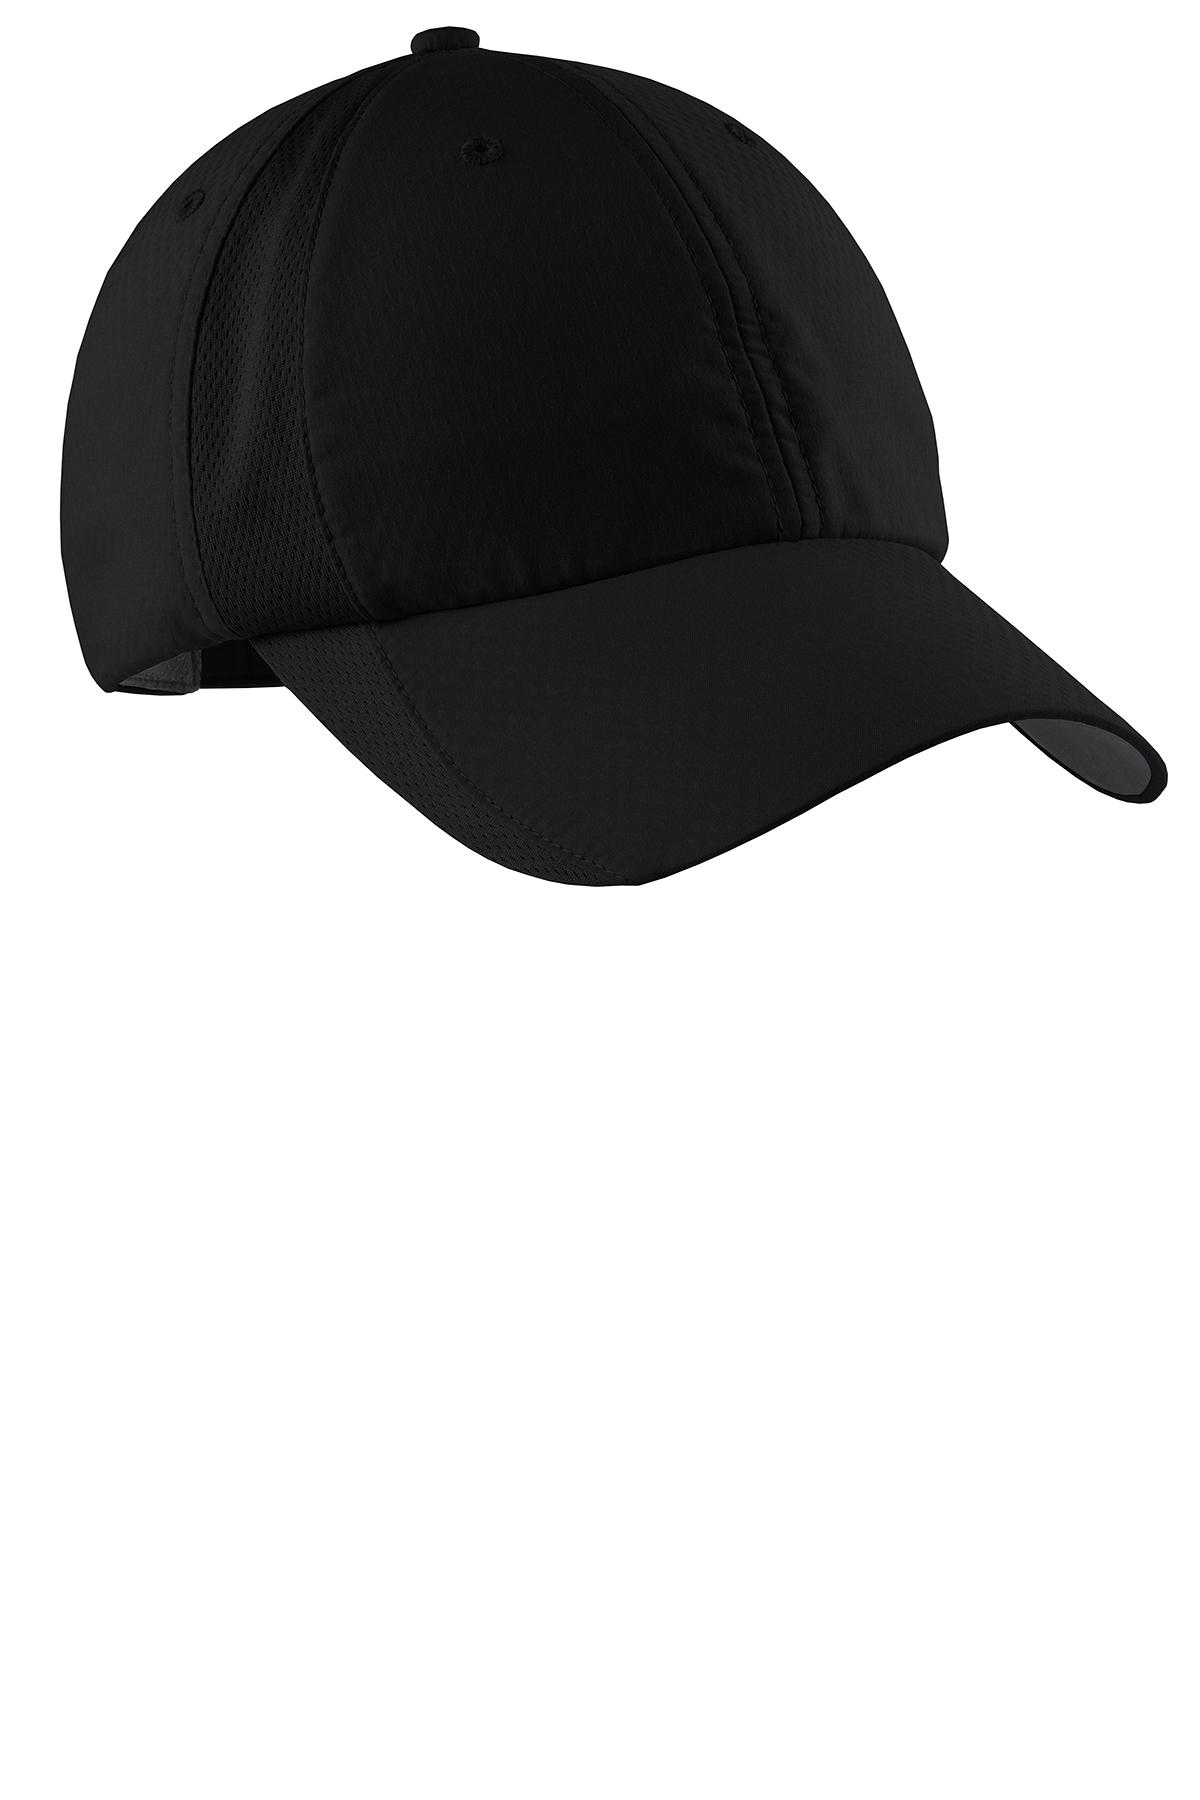 9eab1403e42 Nike Sphere Dry Cap